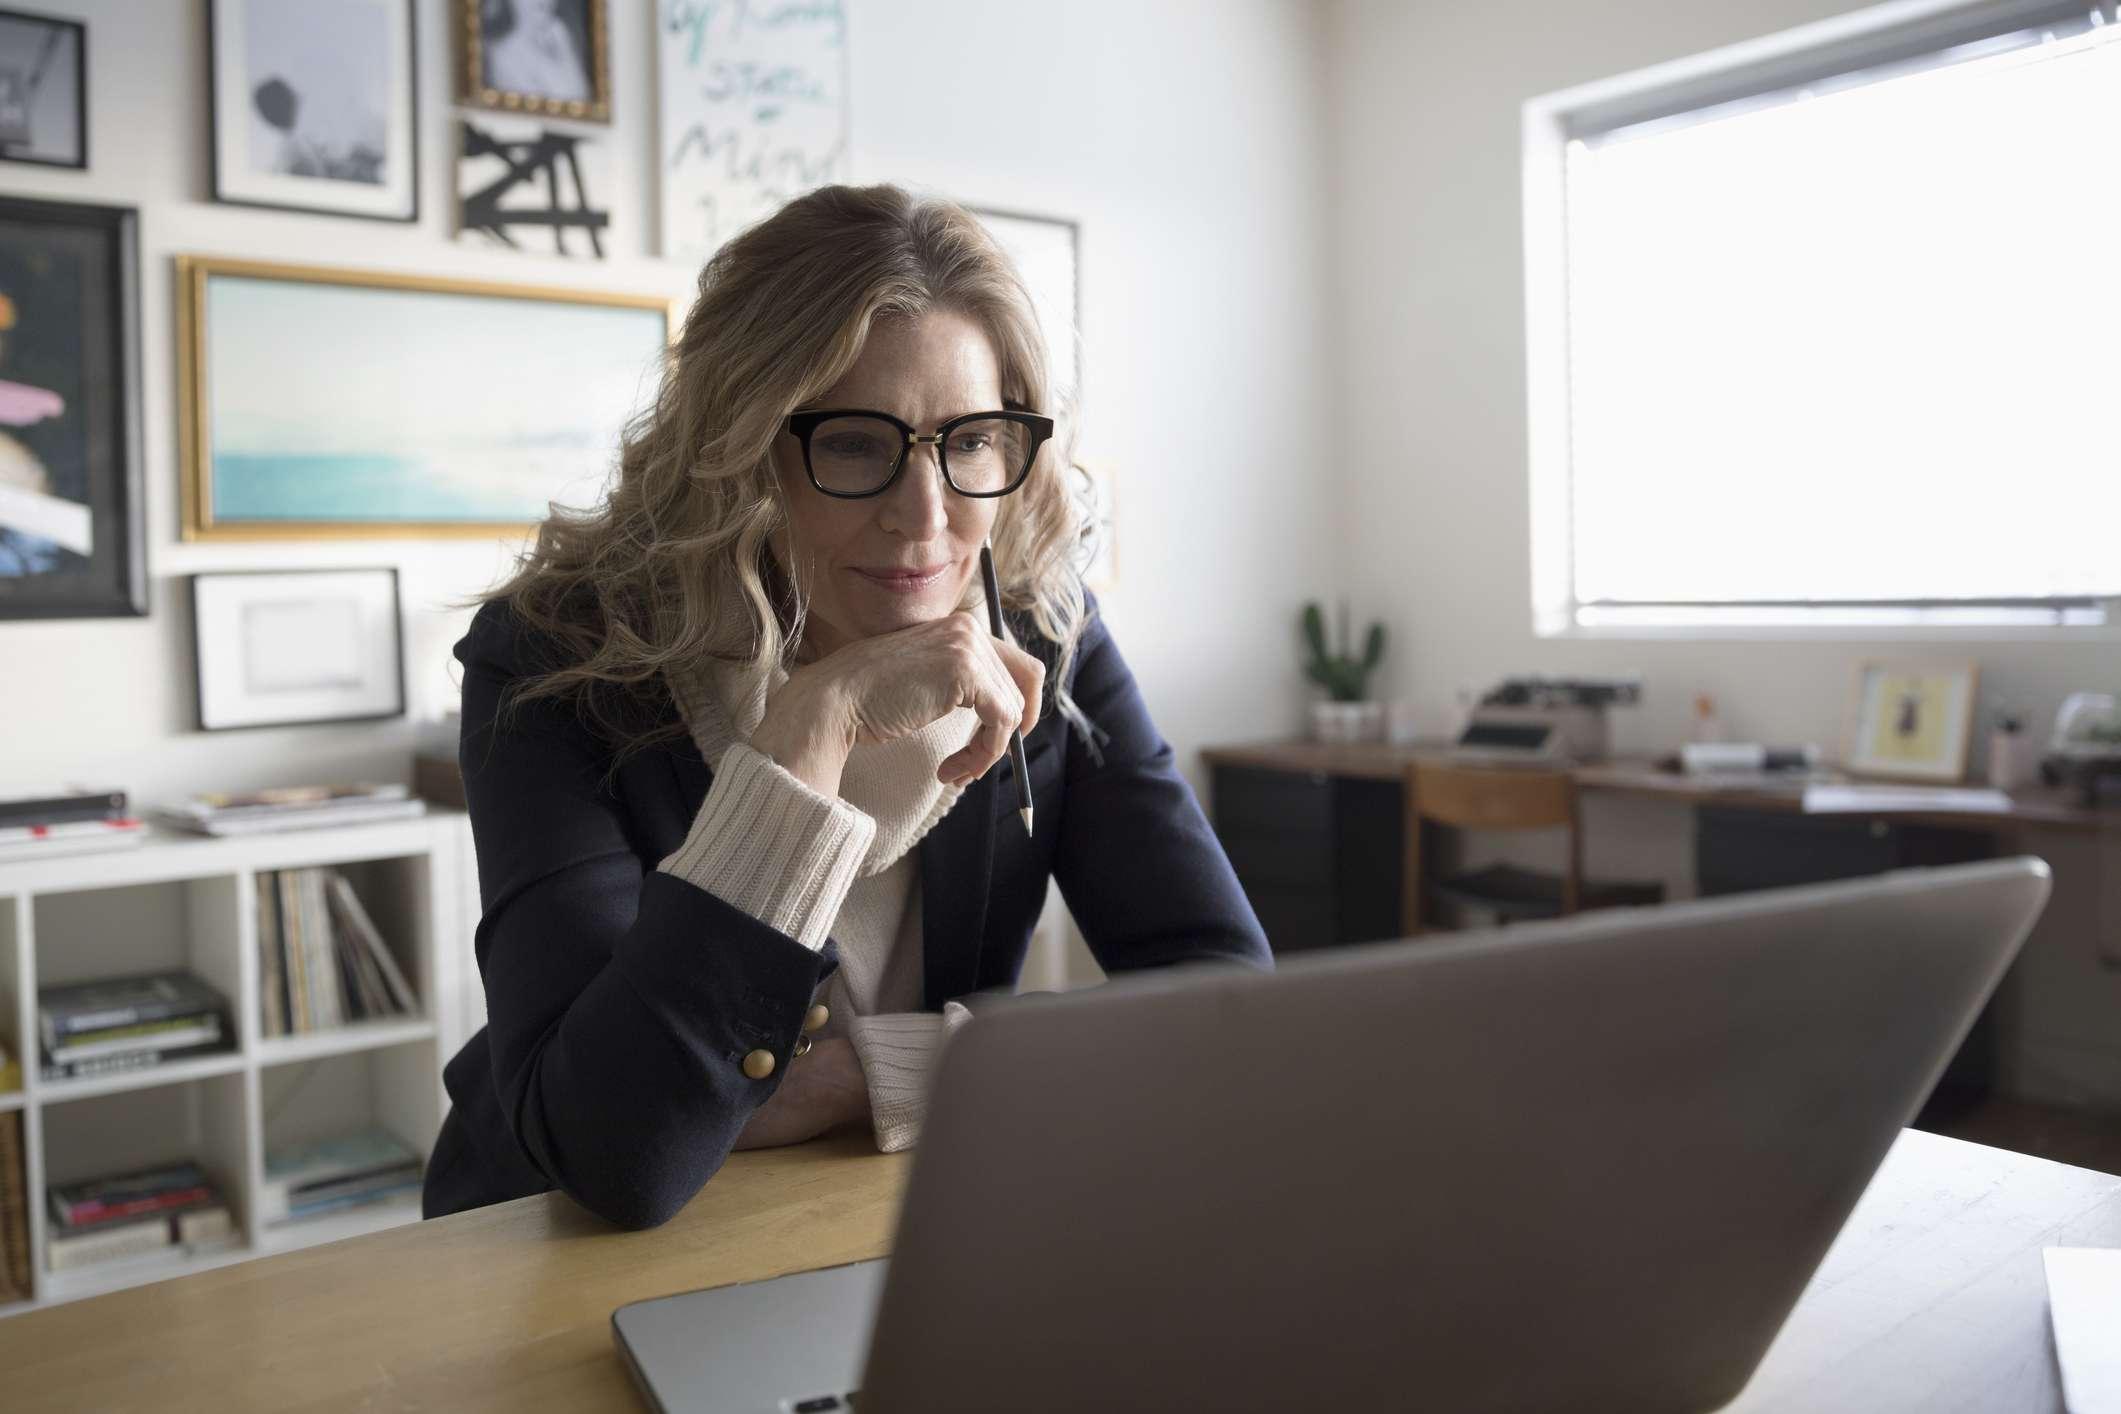 Top 10 Careers For Women Over 50